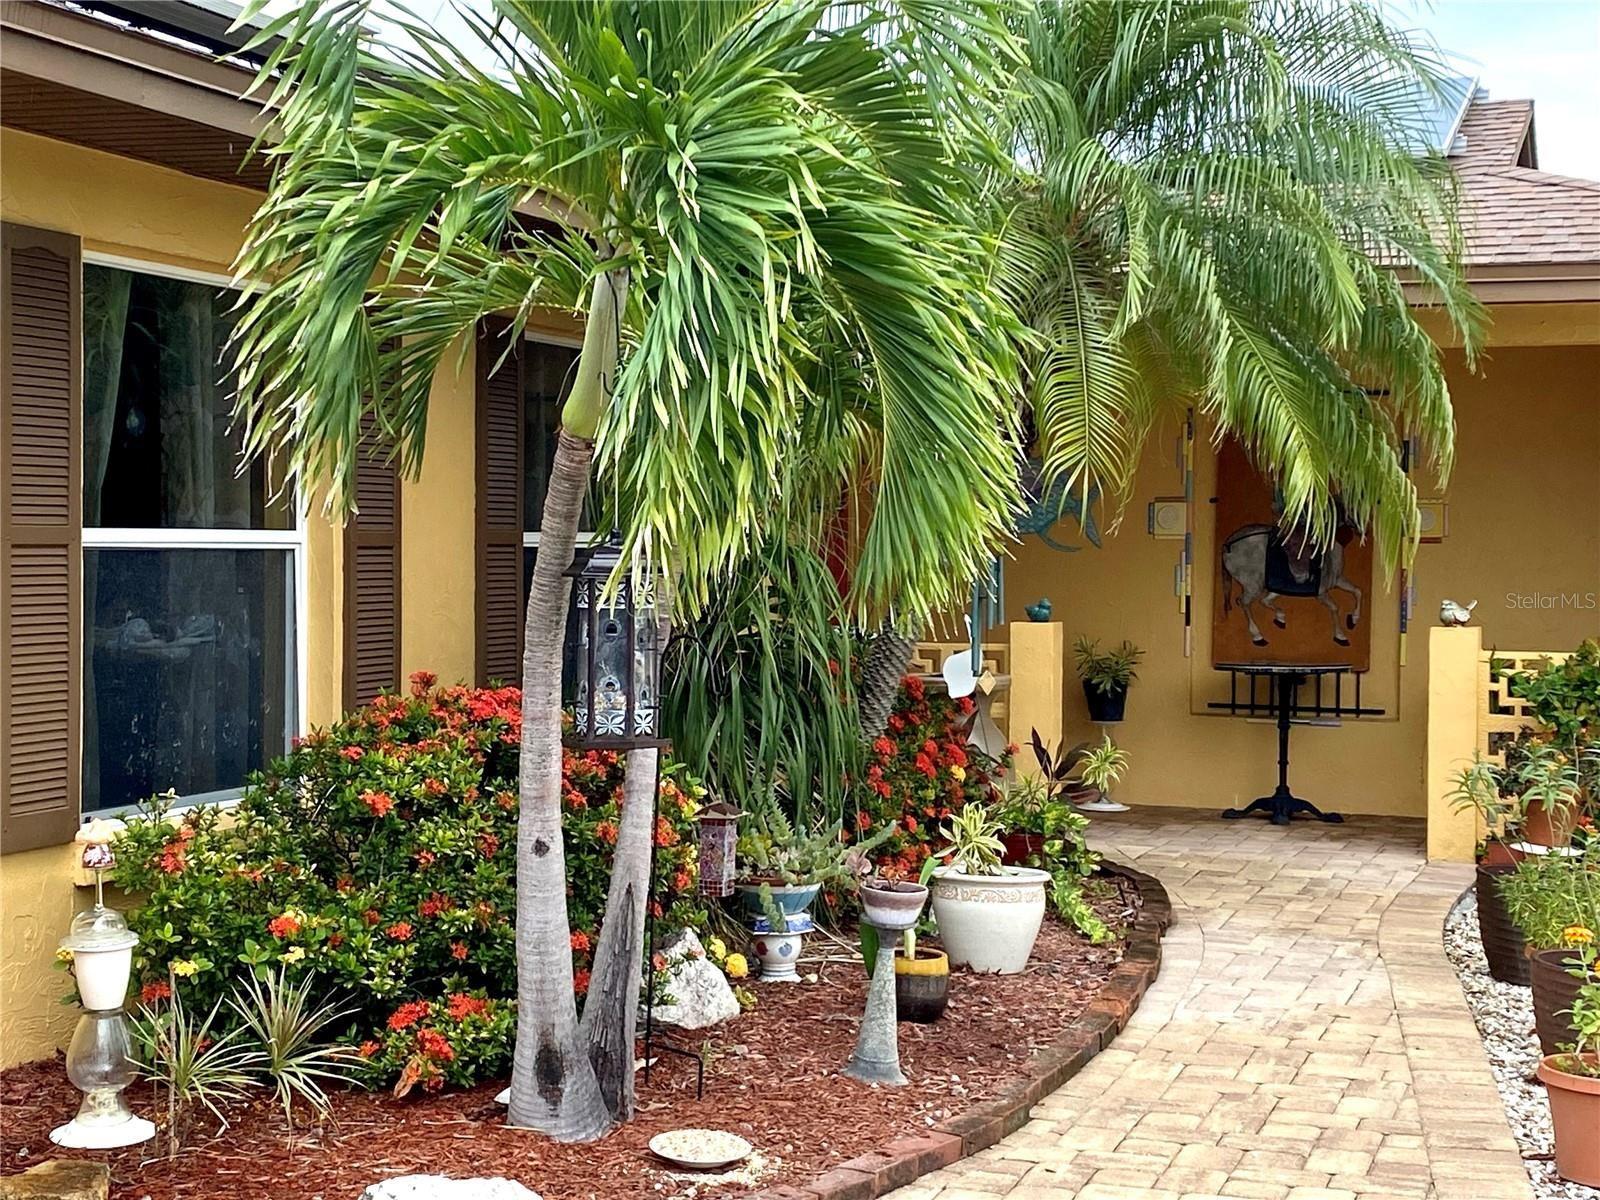 Photo of 615 GLADSTONE LANE, HOLMES BEACH, FL 34217 (MLS # T3323364)